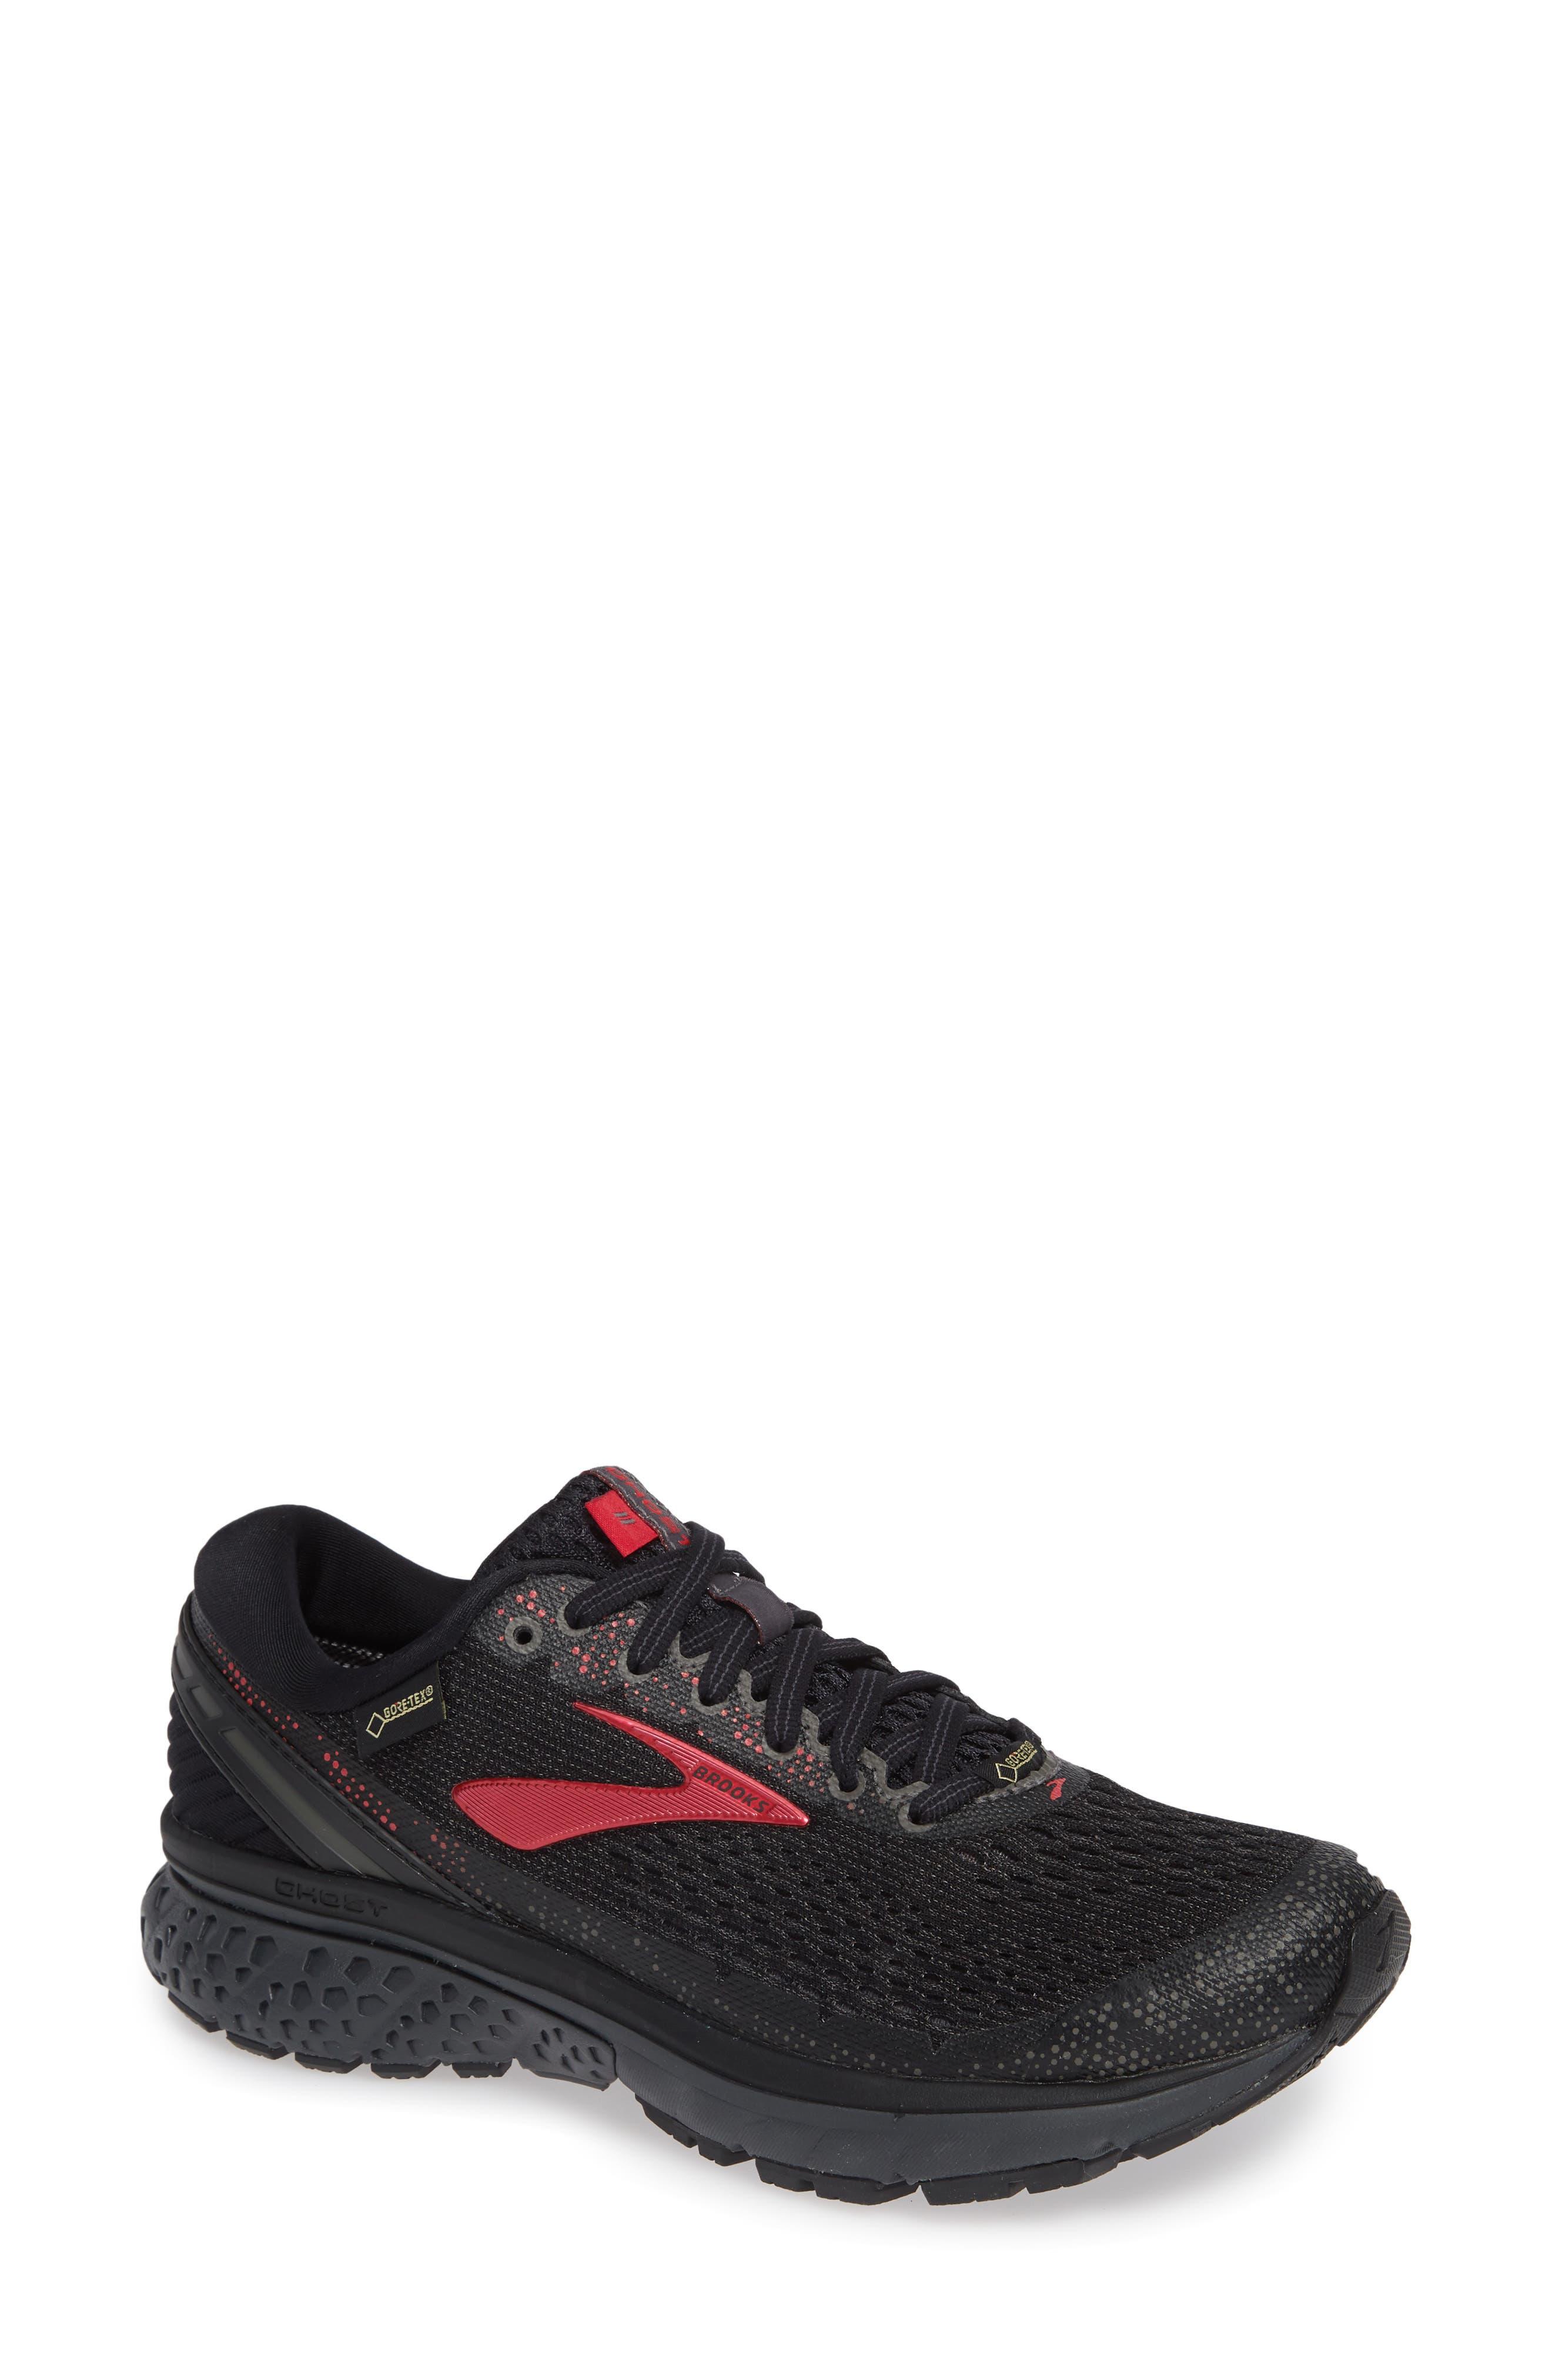 Ghost 11 GTX Gore-Tex<sup>®</sup> Waterproof Running Shoe, Main, color, BLACK/ PINK/ EBONY